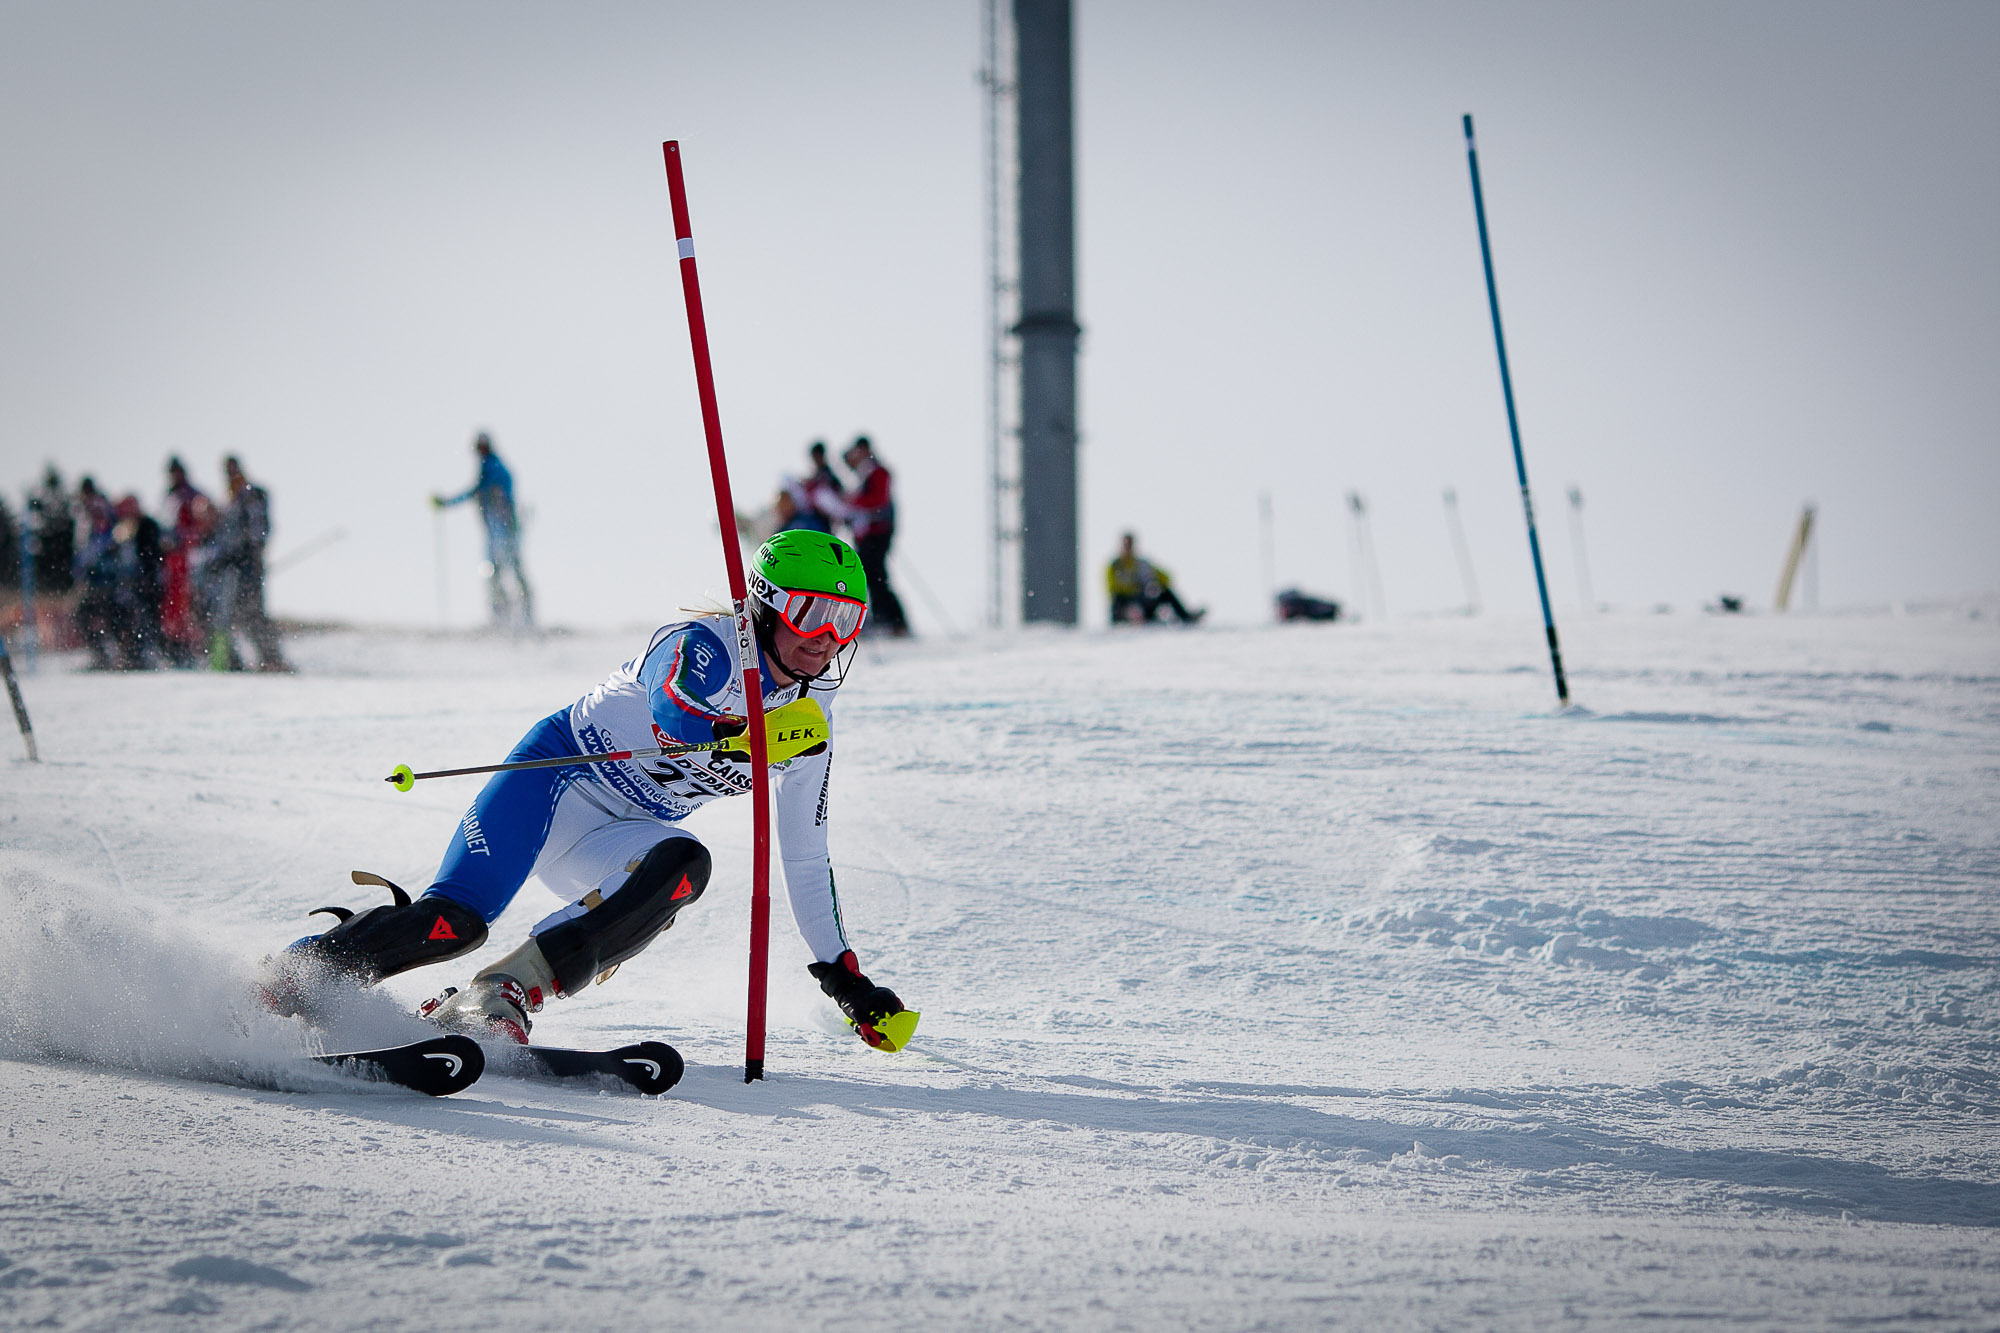 Coupe_Europe_ski_dames-339.jpg